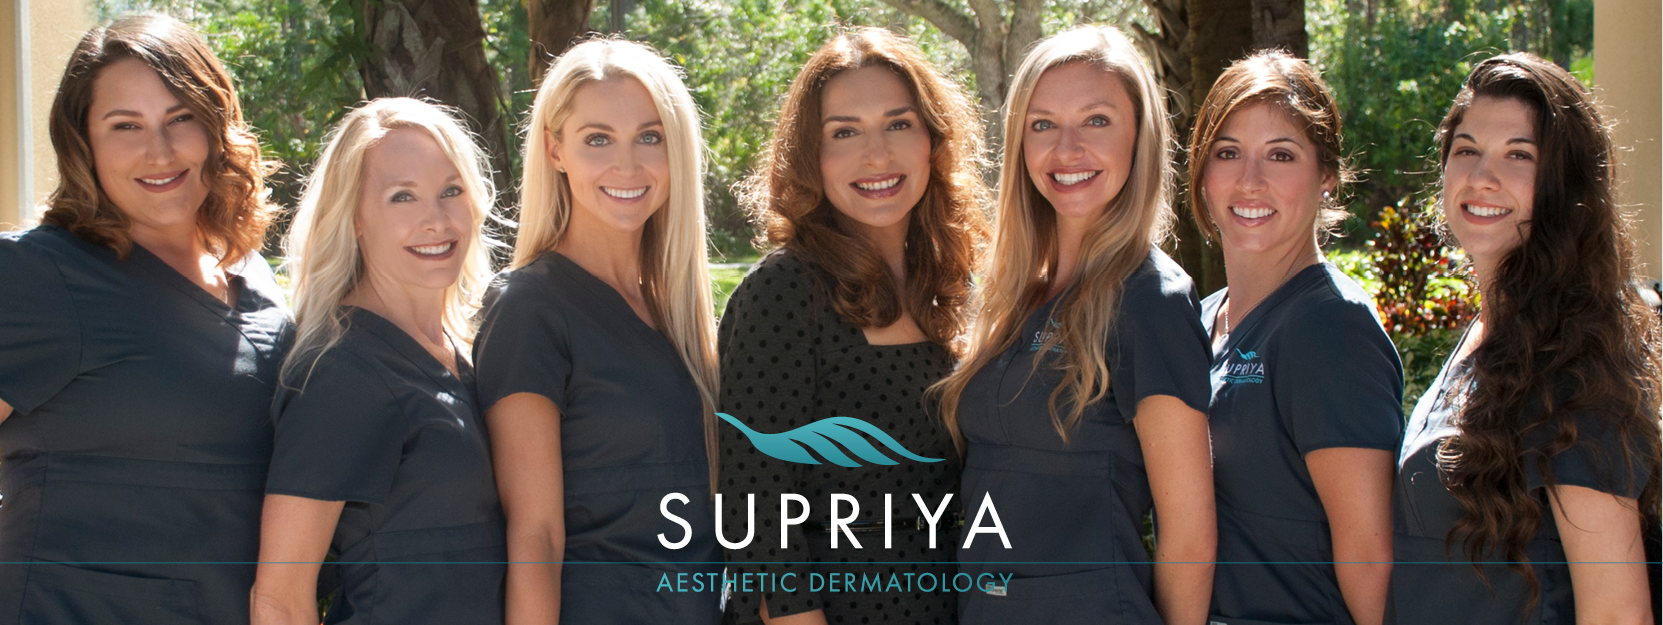 Supriya Aesthetic Dermatology